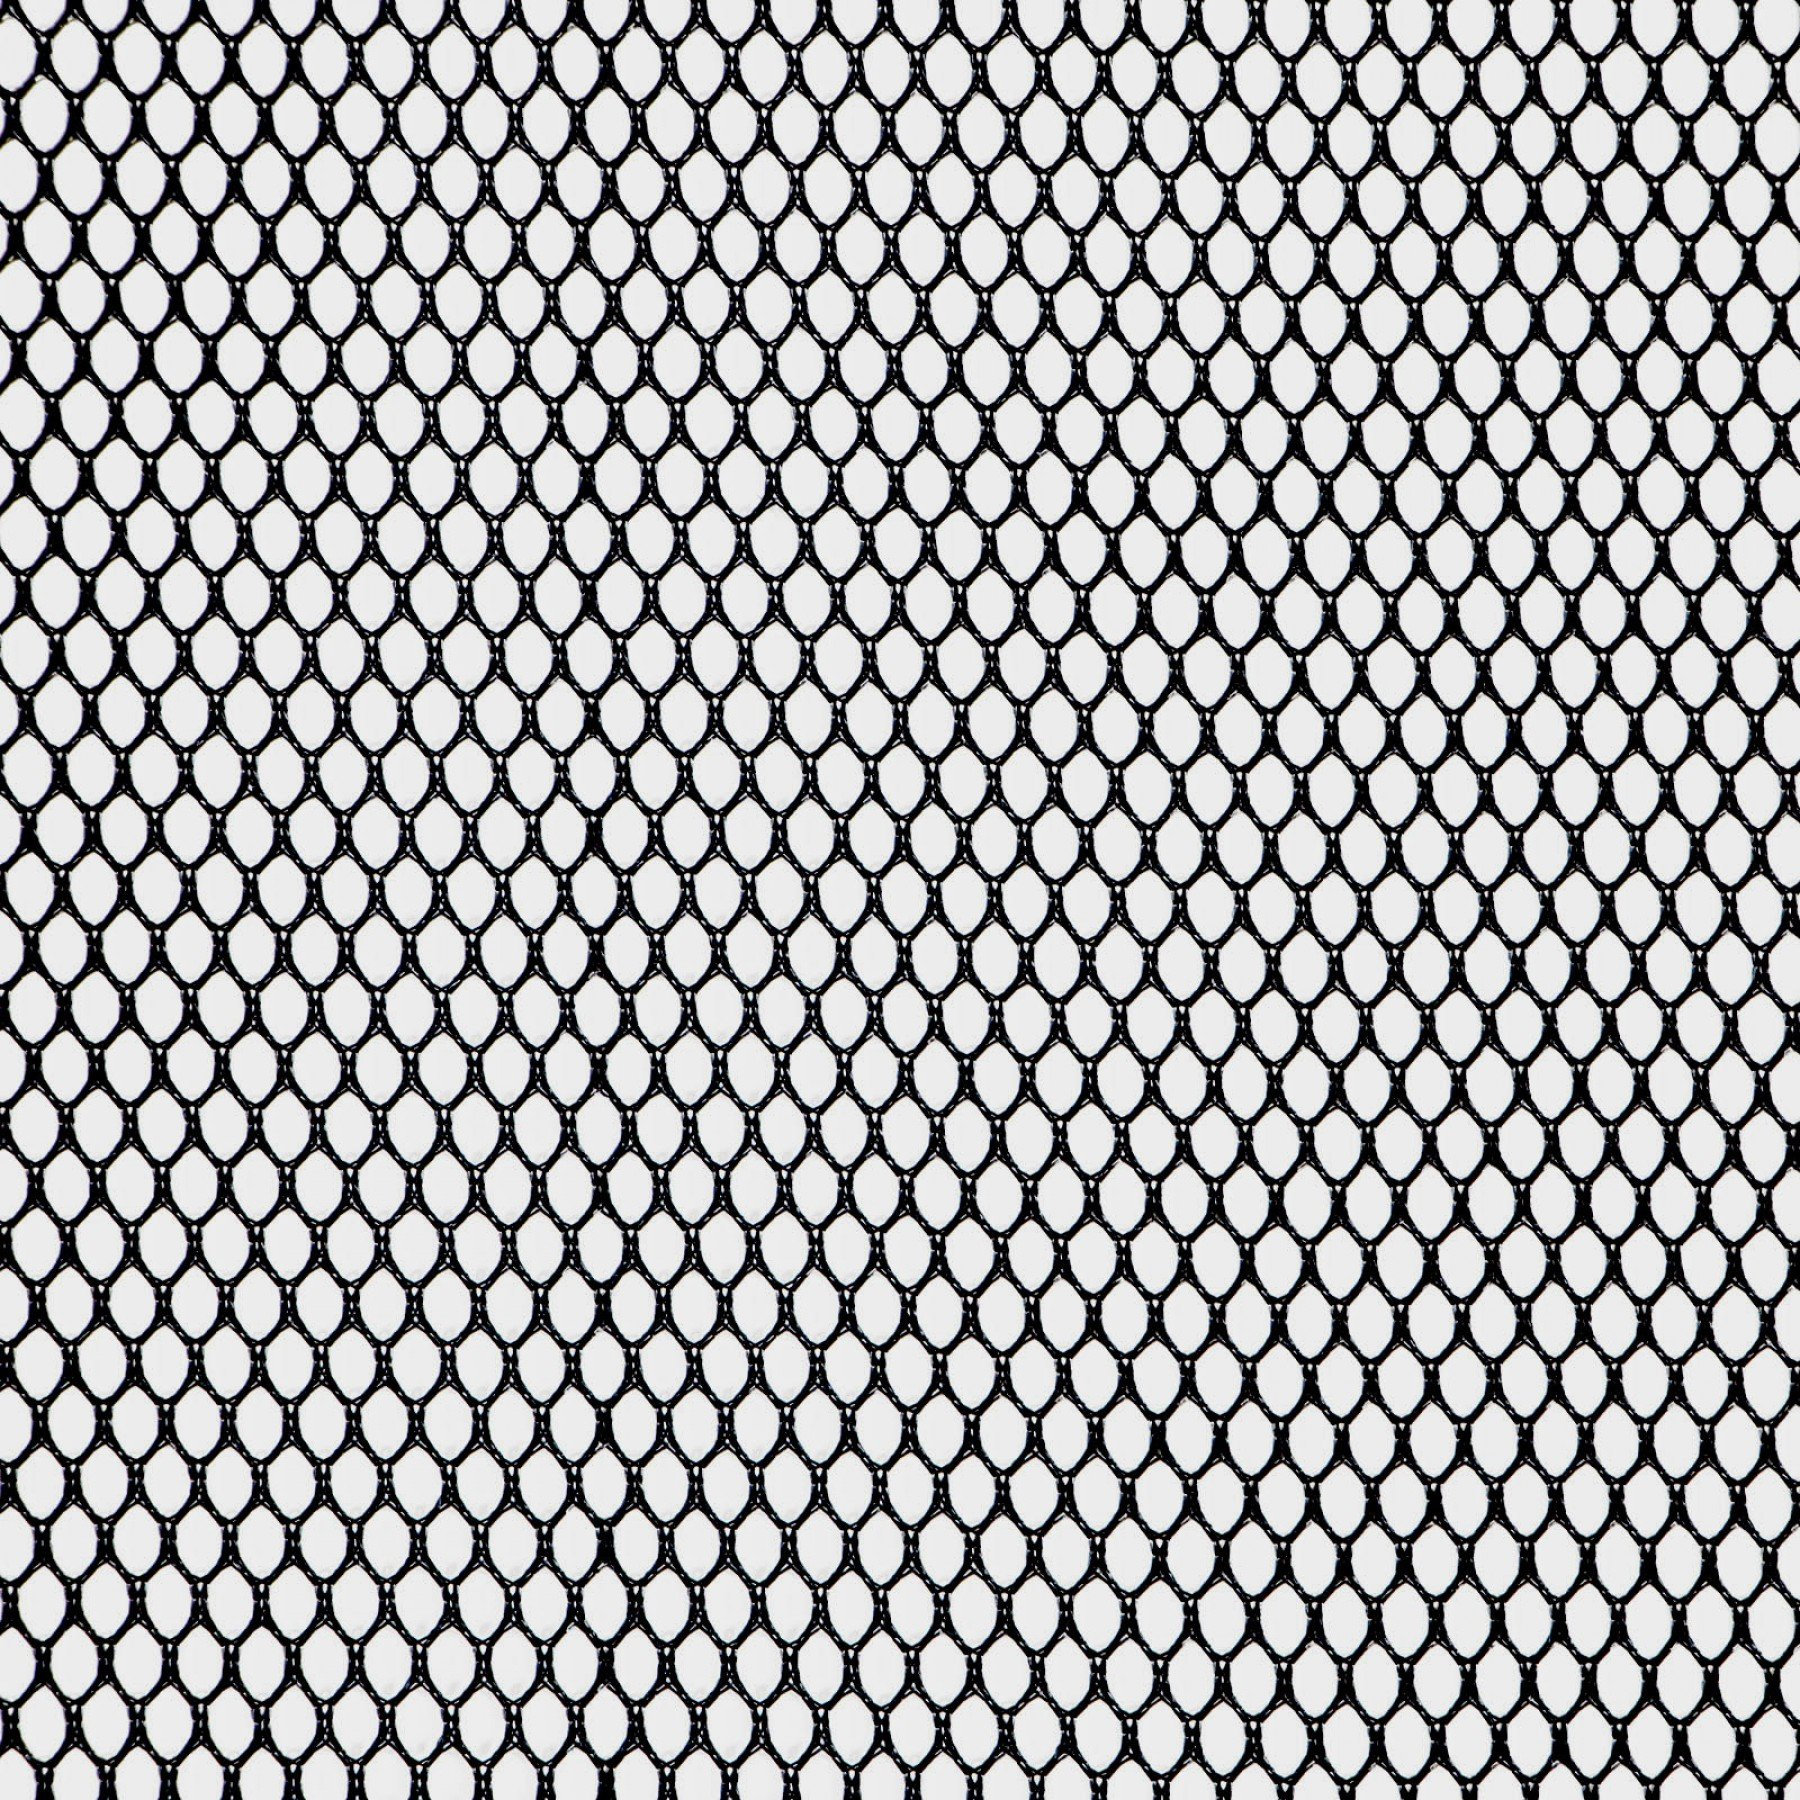 Lightweight Mesh Fabric  EE Schenck Co